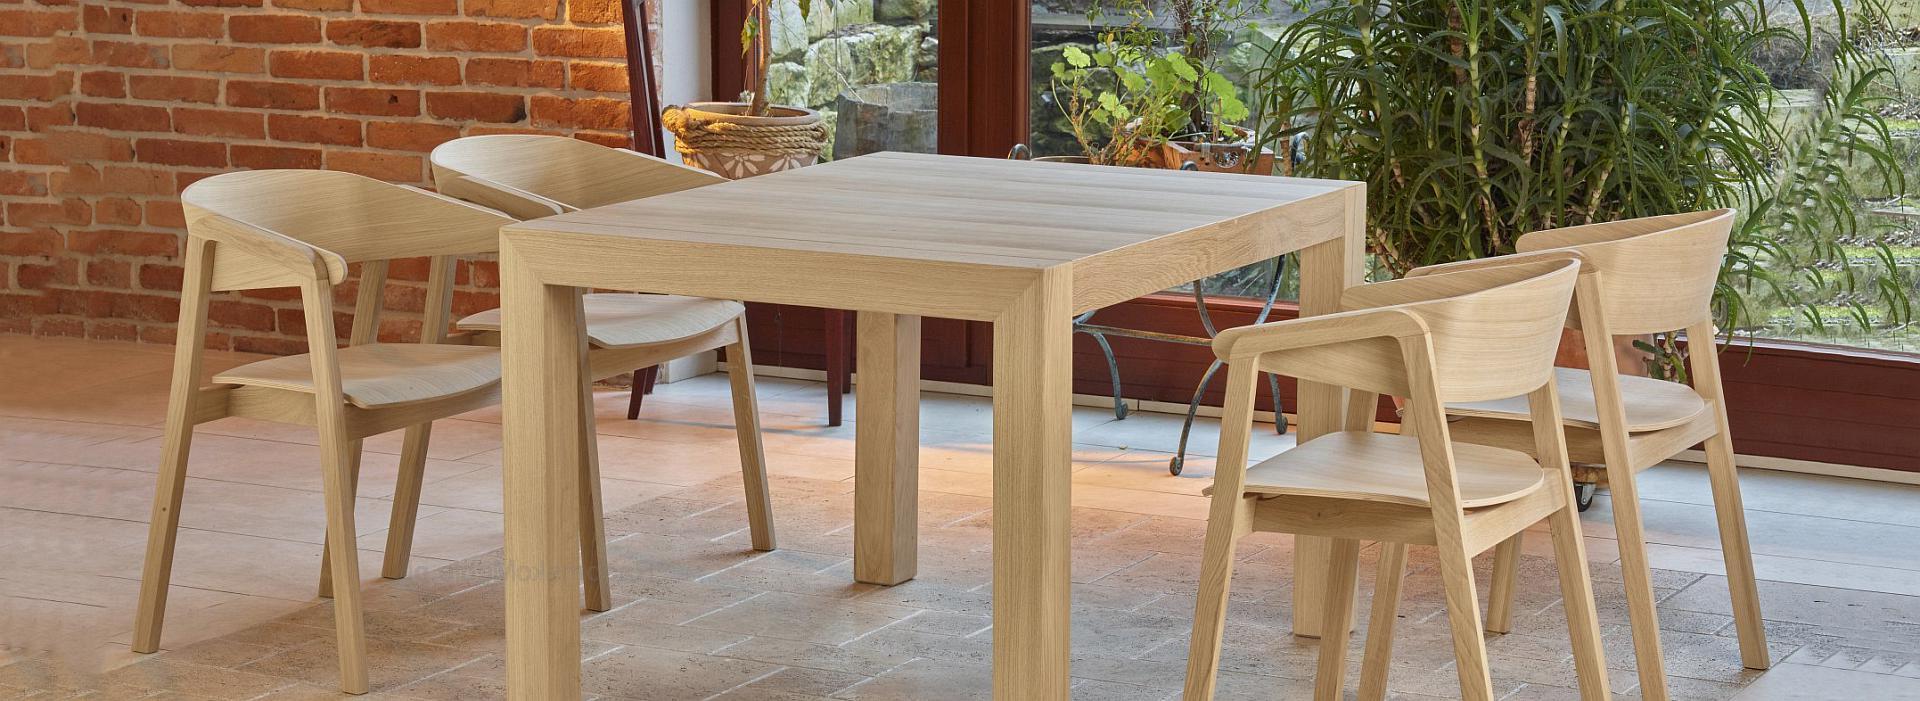 Stół ST-SINPLE + Fotel CAVA BS DĄB